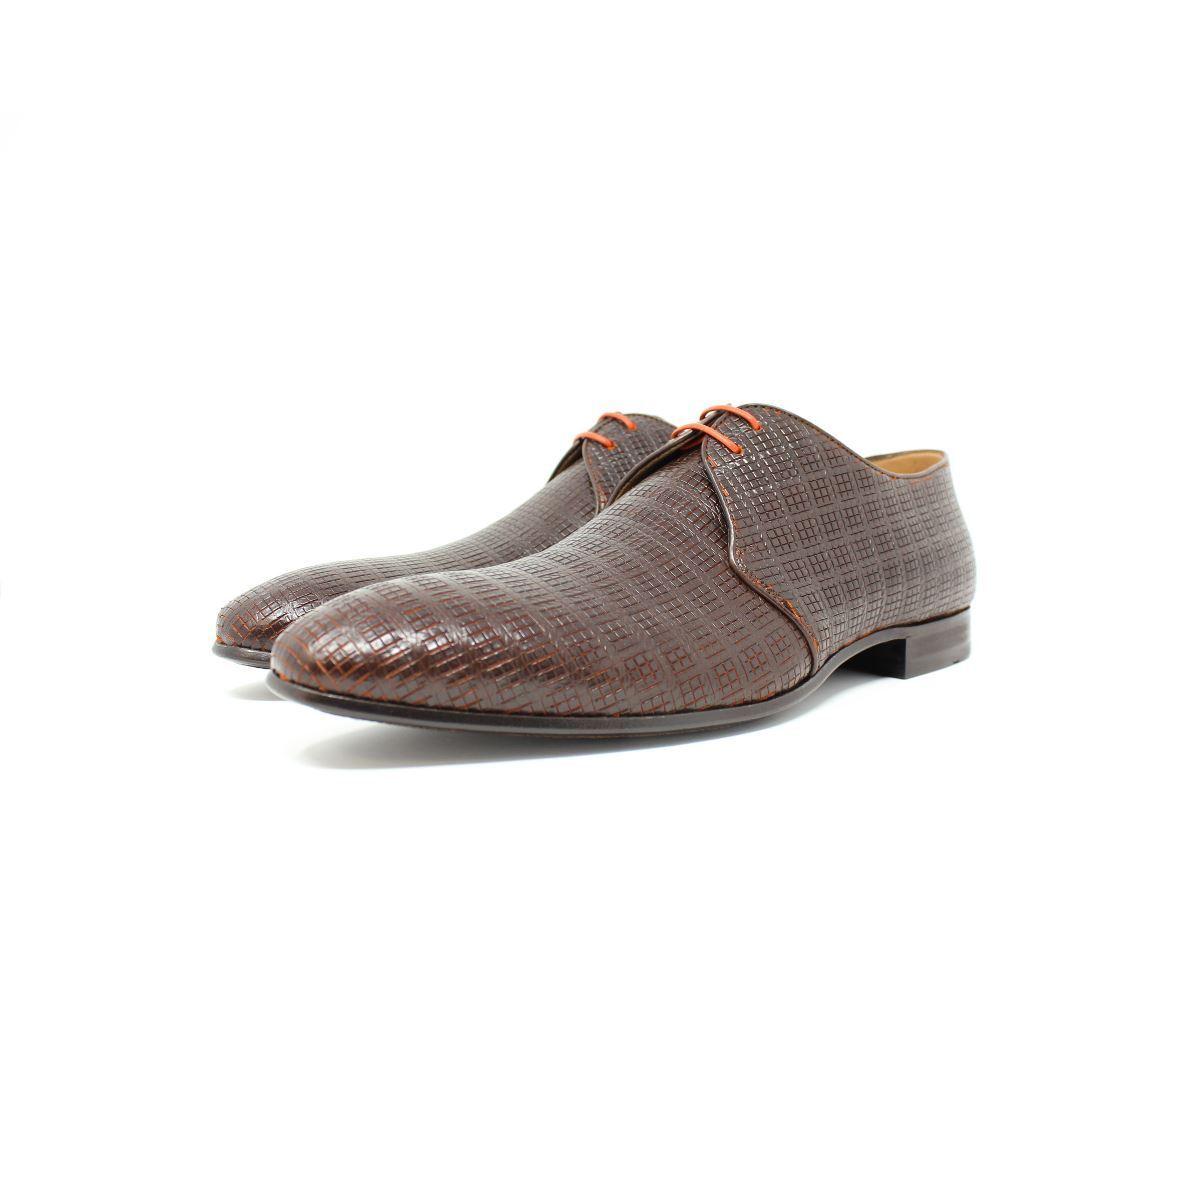 Zapatos de vestir Hugo Boss Motrec hombre